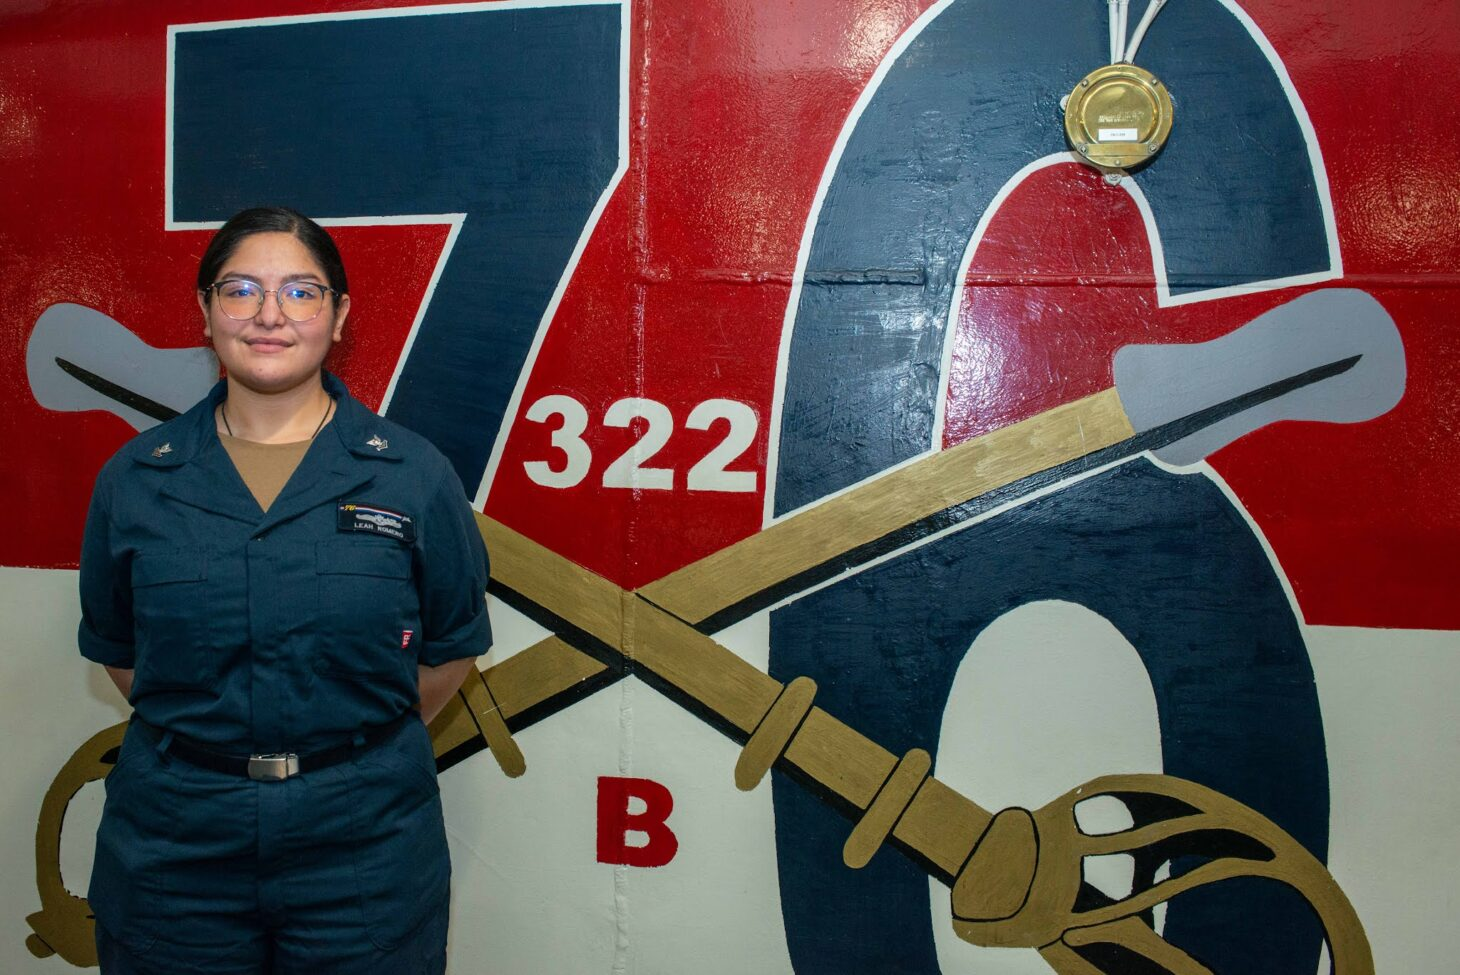 Petty Officer 2nd Class Leah Romero